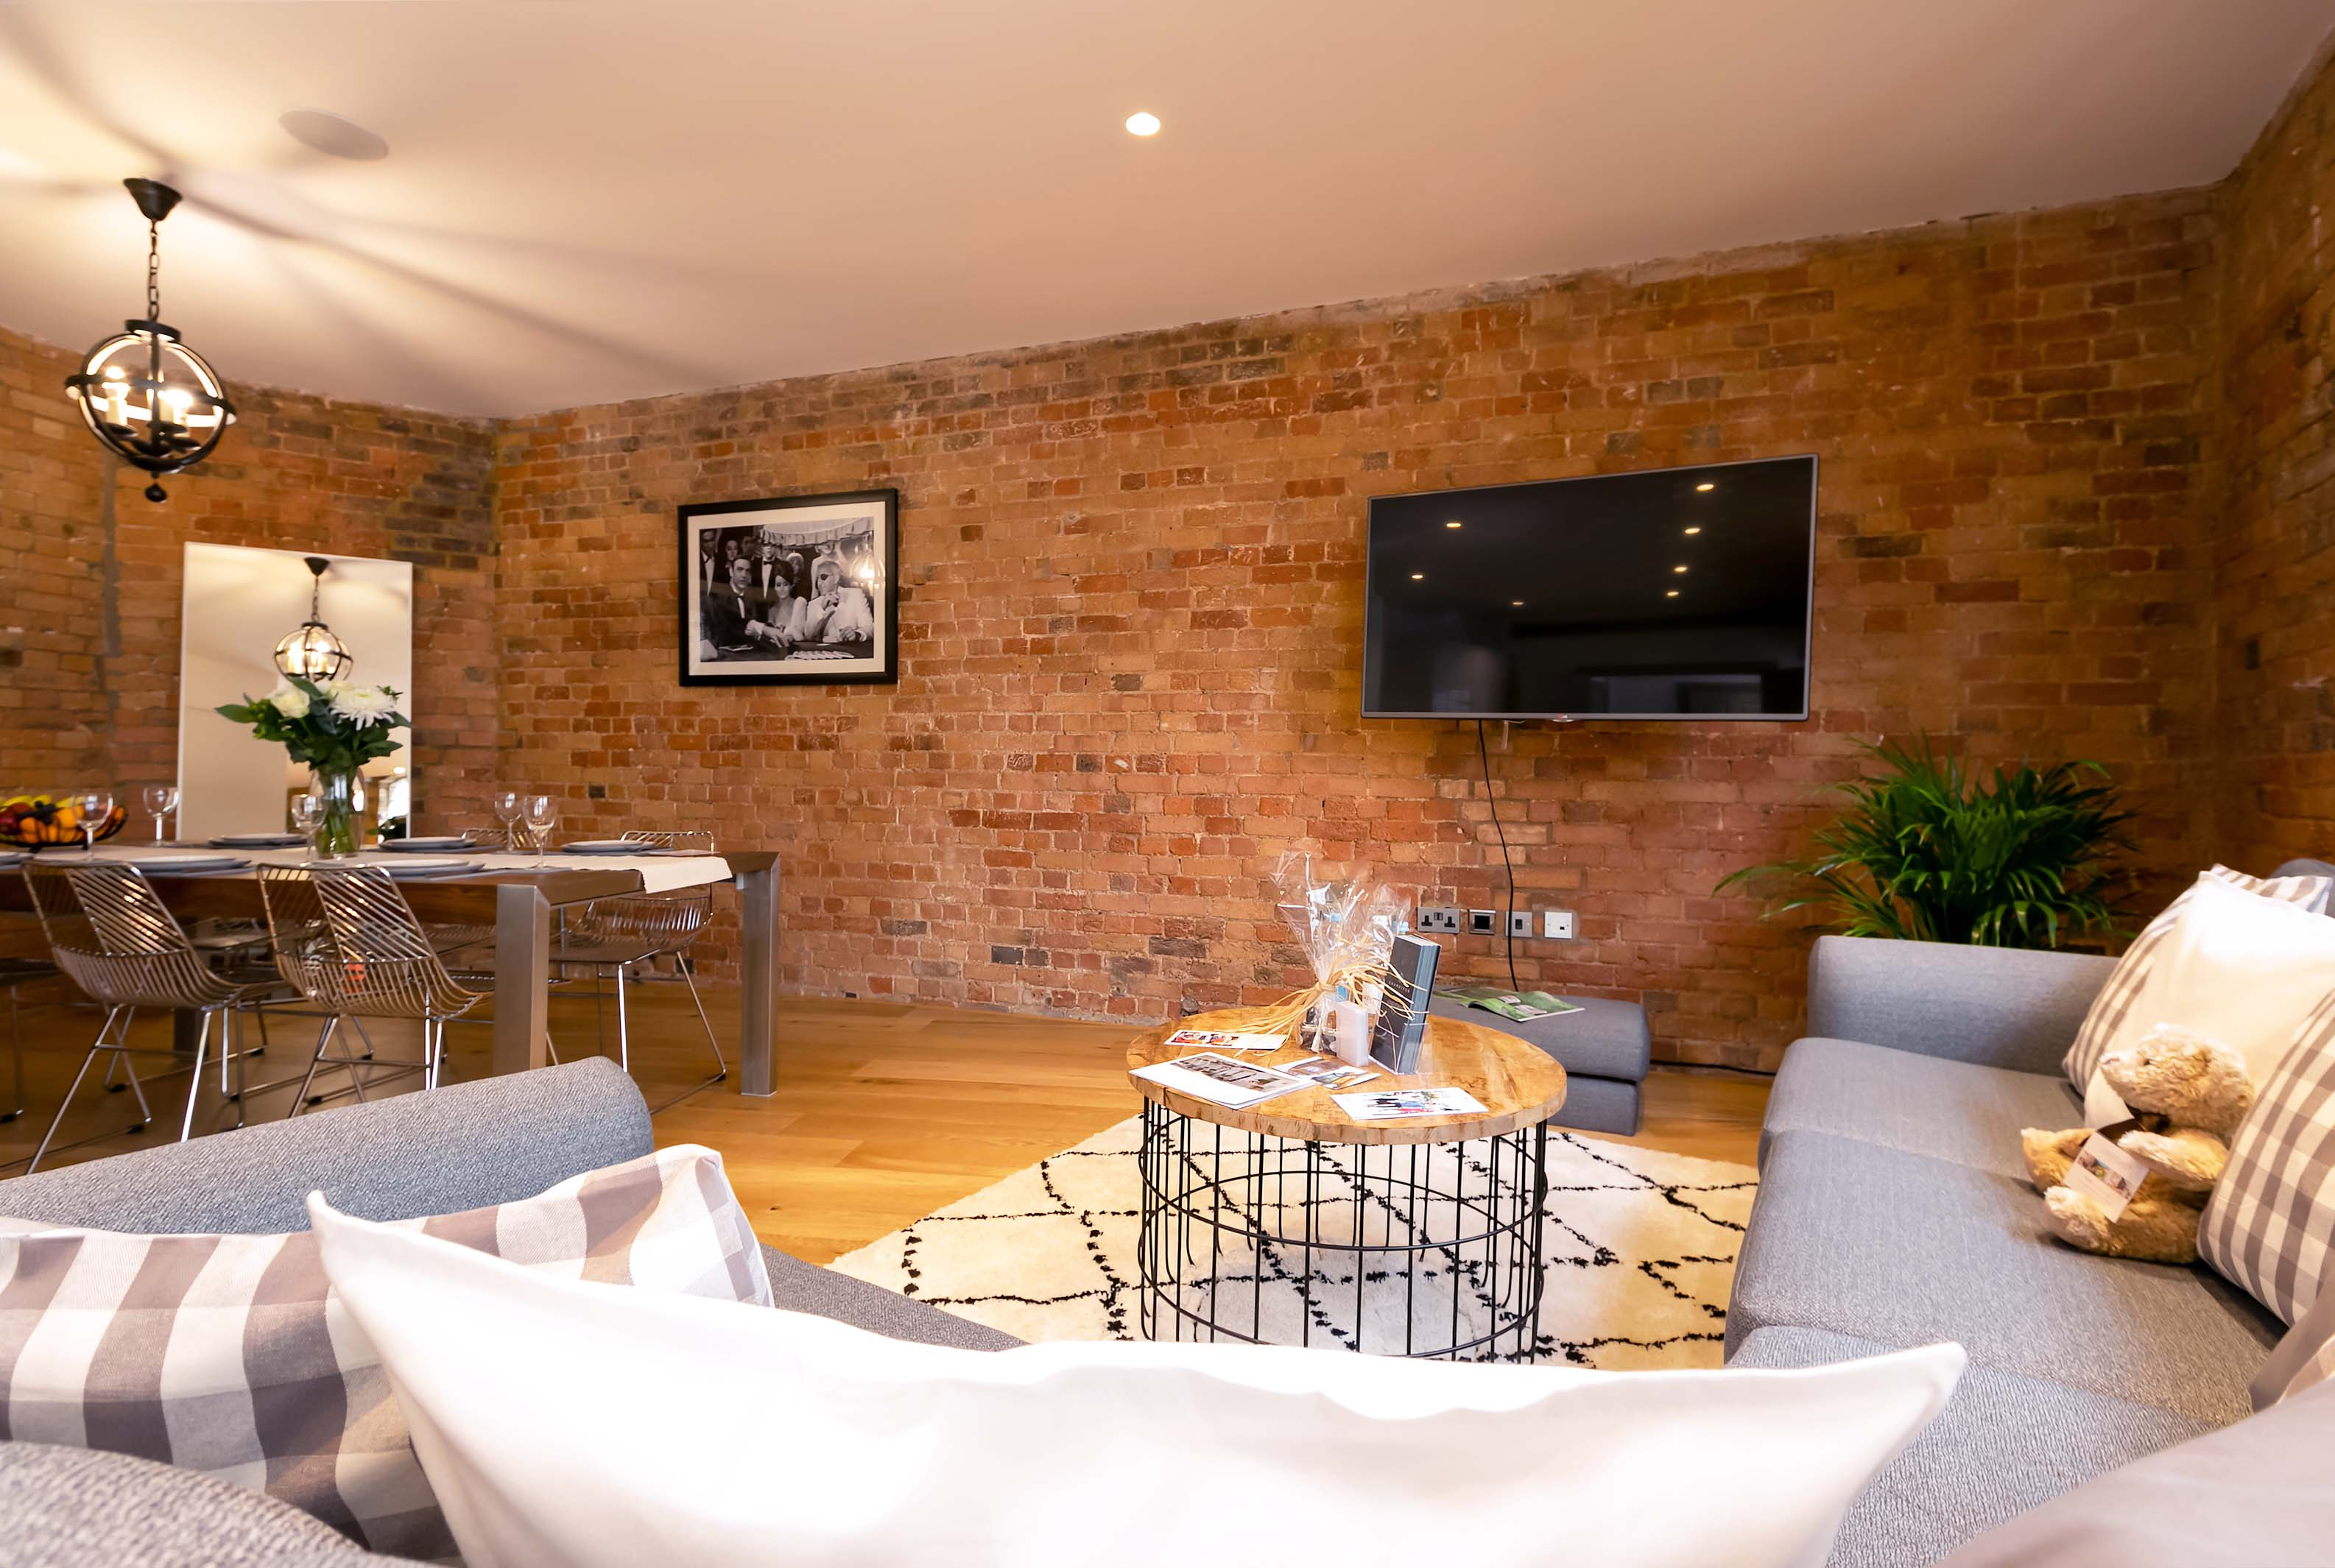 Lovelydays luxury service apartment rental - London - Fitzrovia - Wells Mews B - Lovelysuite - 2 bedrooms - 2 bathrooms - Luxury living room - 17f72f1317ef - Lovelydays